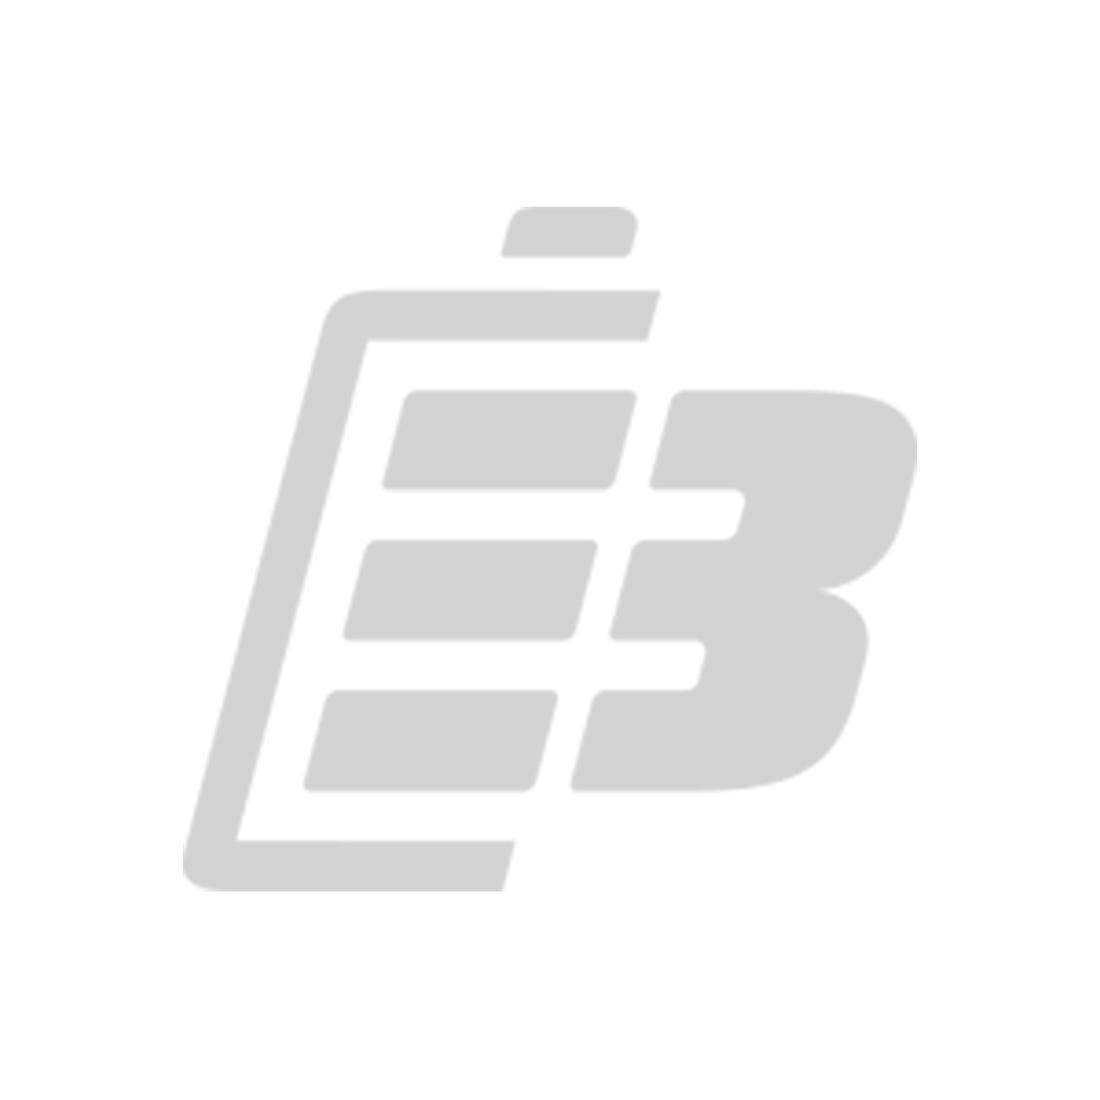 Laptop battery Asus GL552_1